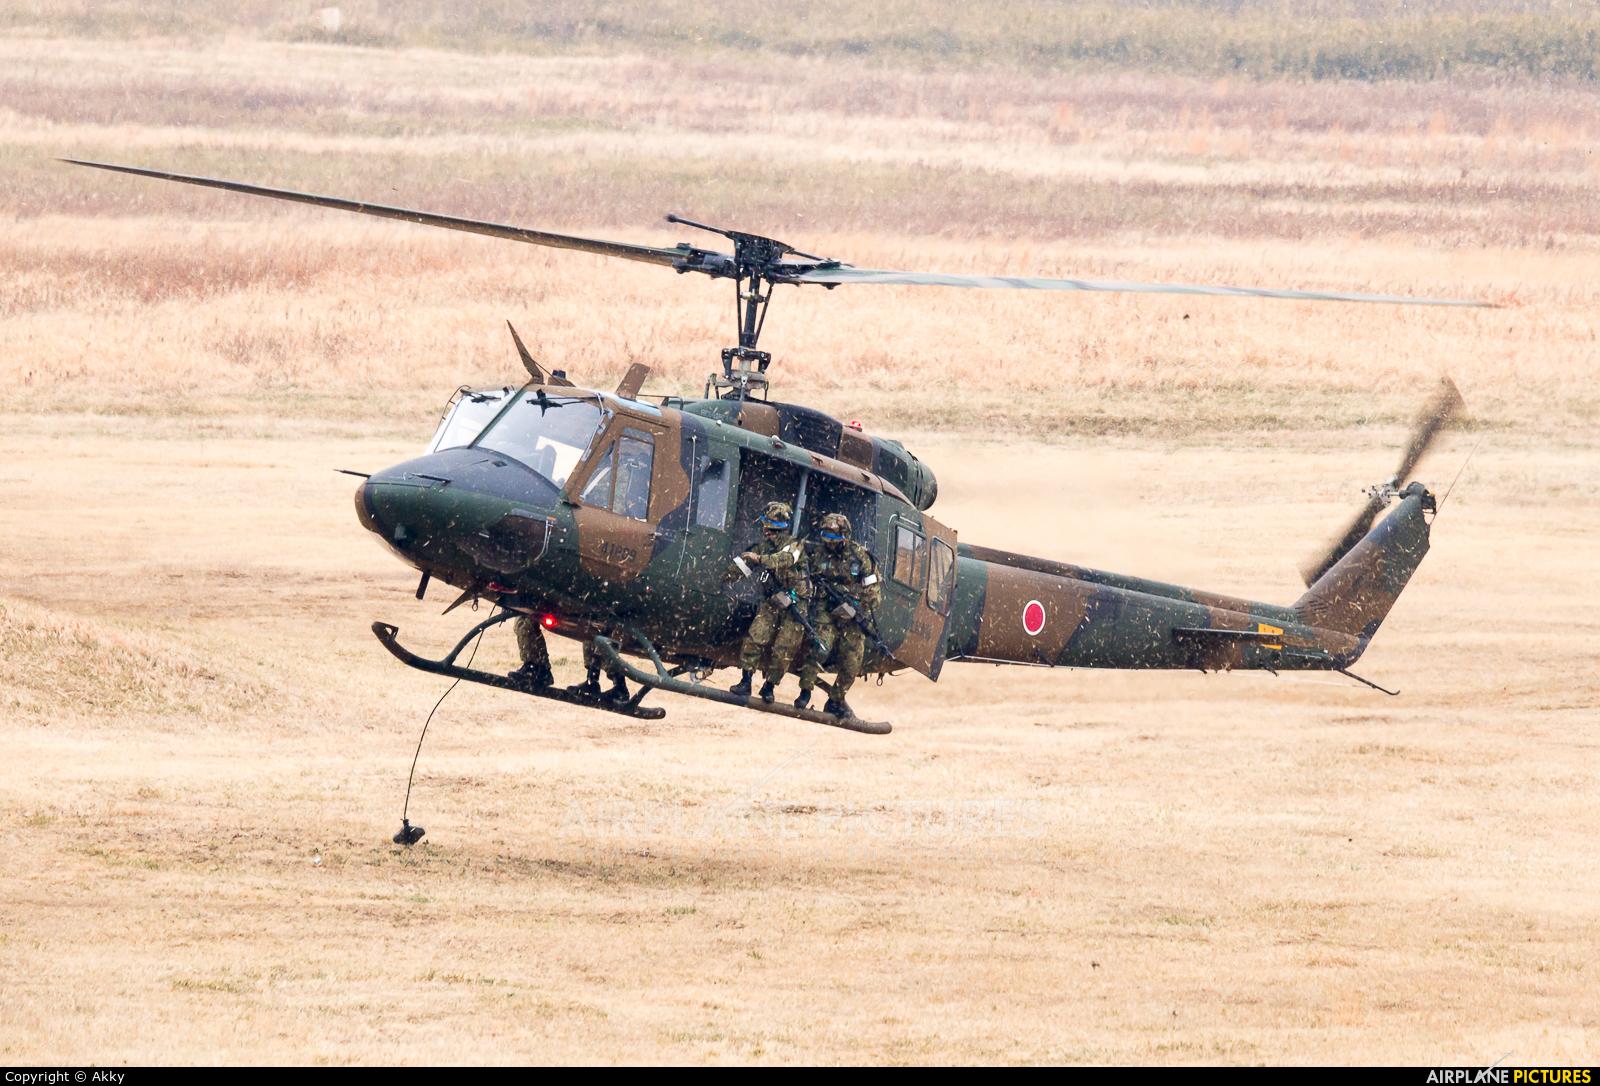 Japan - Ground Self Defense Force 41809 aircraft at Off Airport - Japan